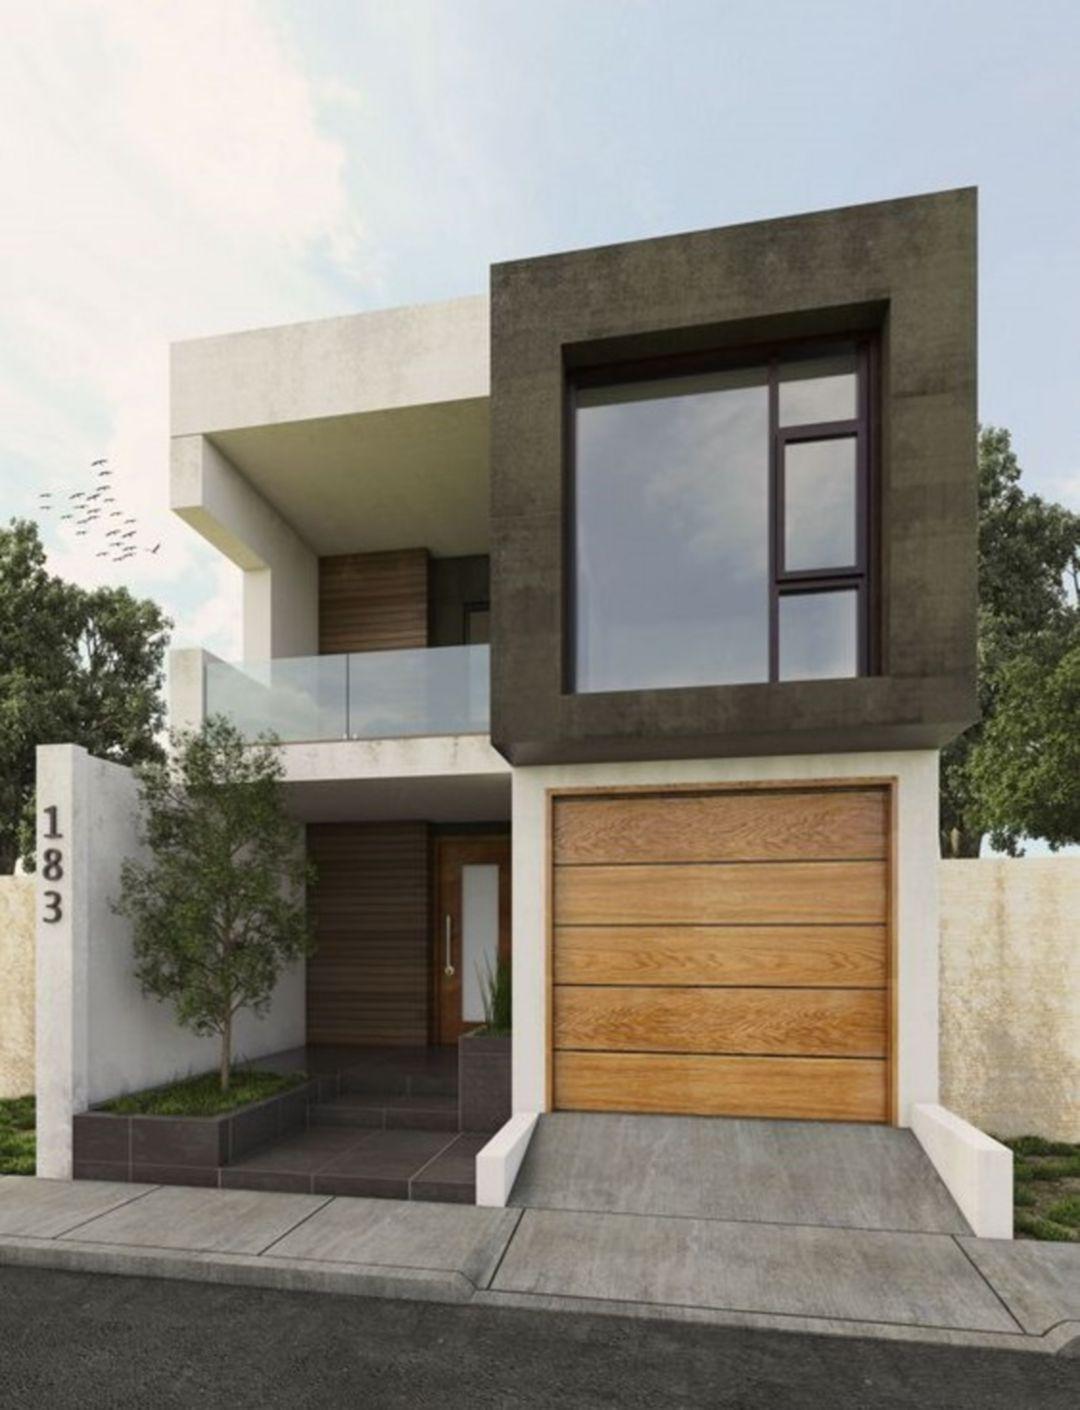 13 Modern Minimalist Tiny House Design Ideas For Your Convenience Modern Minimalist House Facade House Philippines House Design